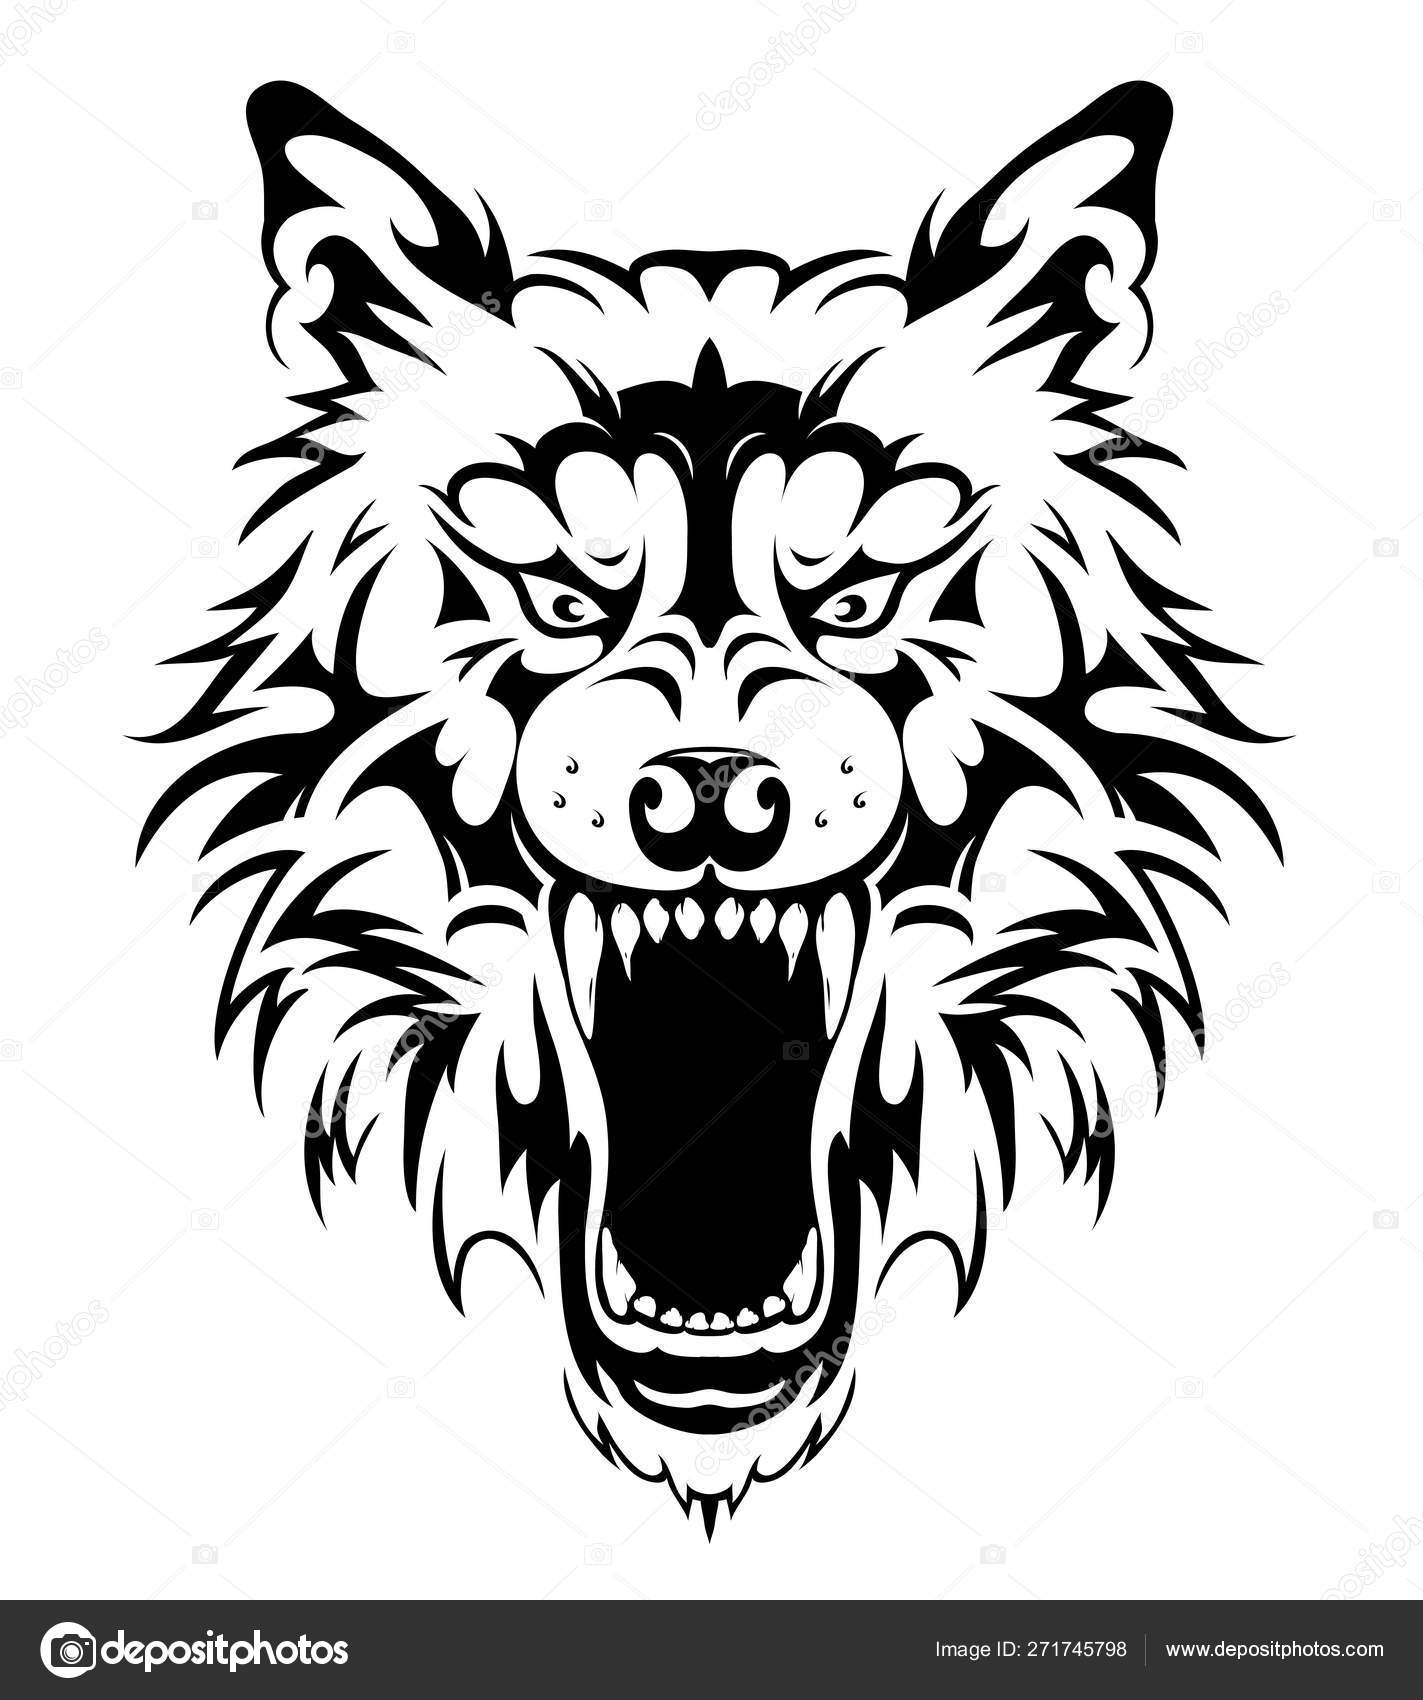 Wolf Head Tattoo Design векторное изображение Akv Lv